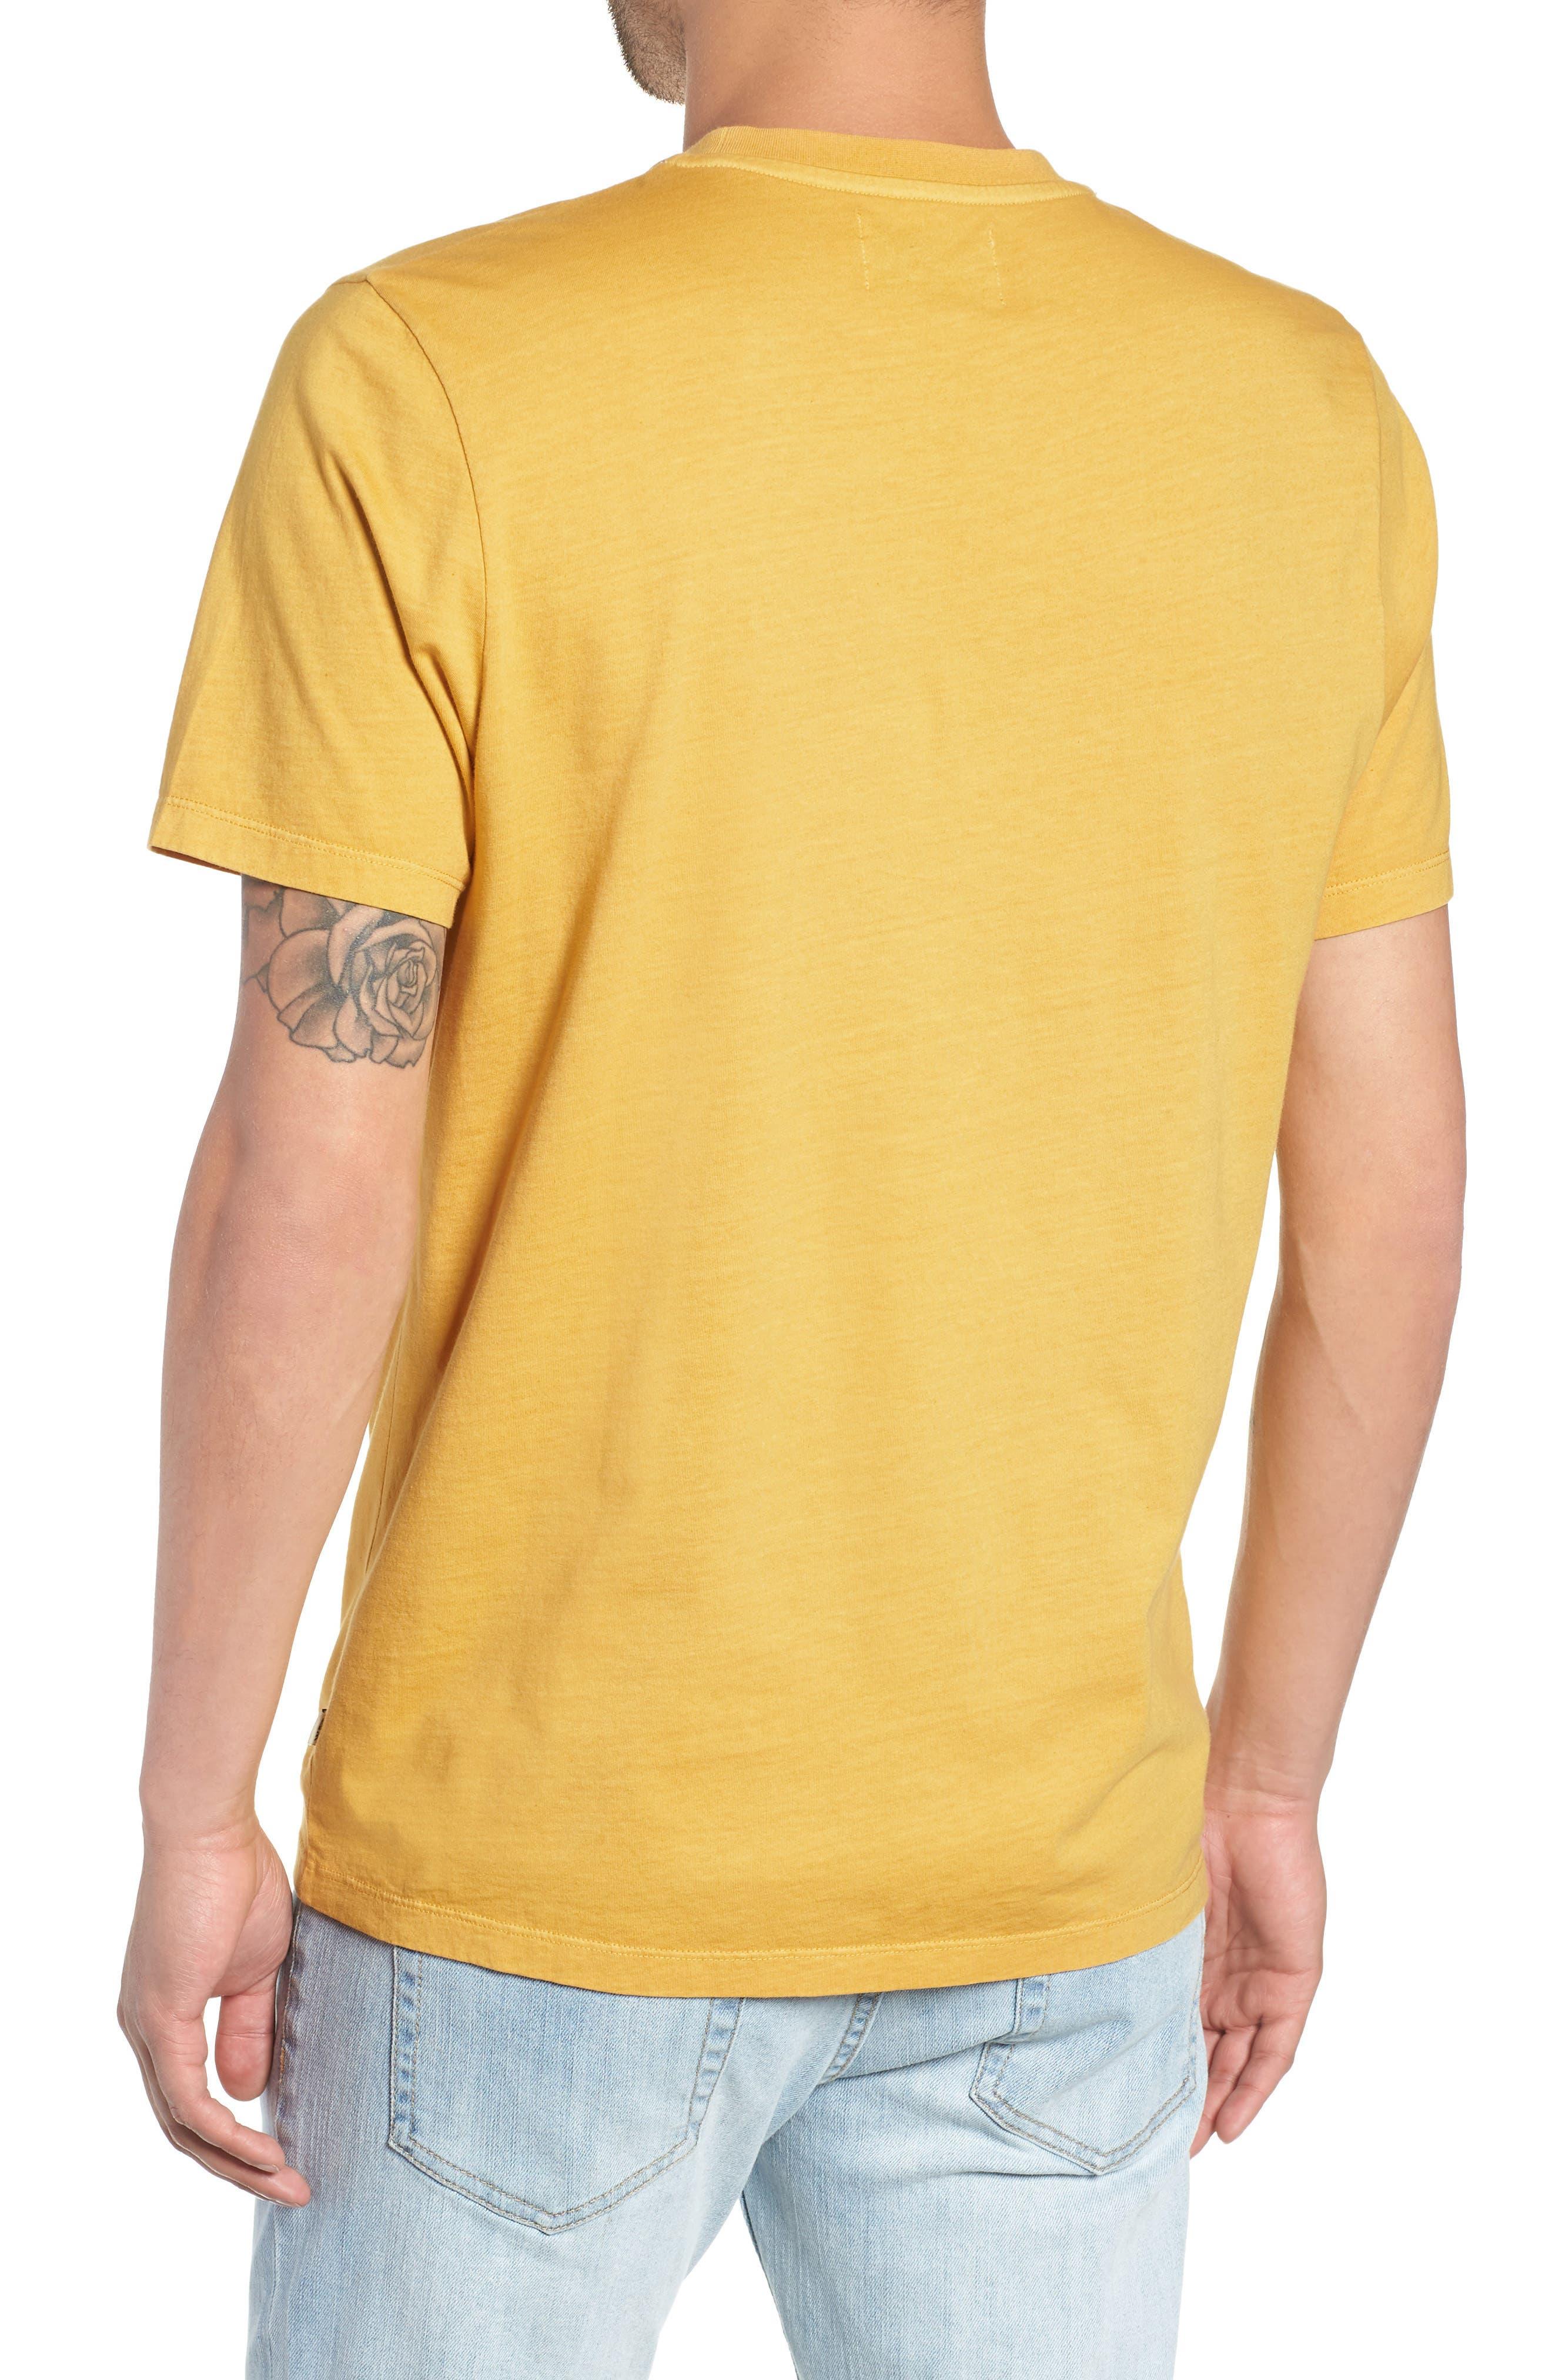 Reid T-Shirt,                             Alternate thumbnail 2, color,                             LEMON